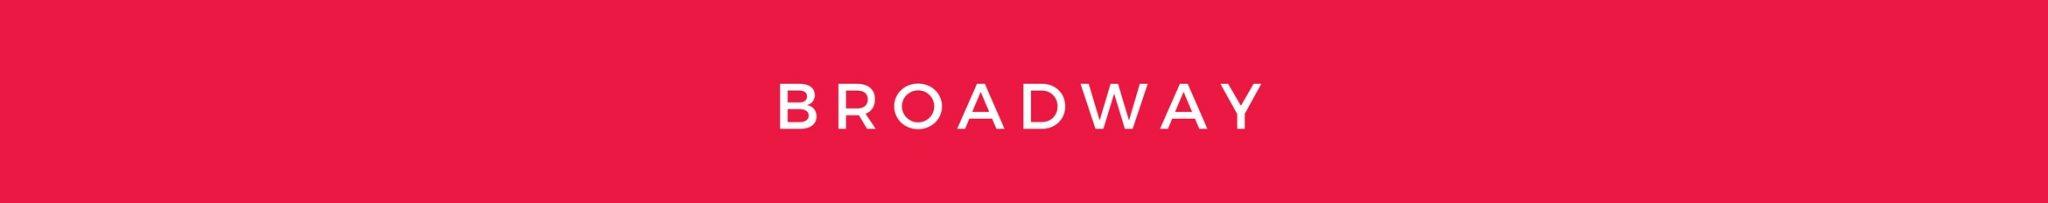 broadway-top